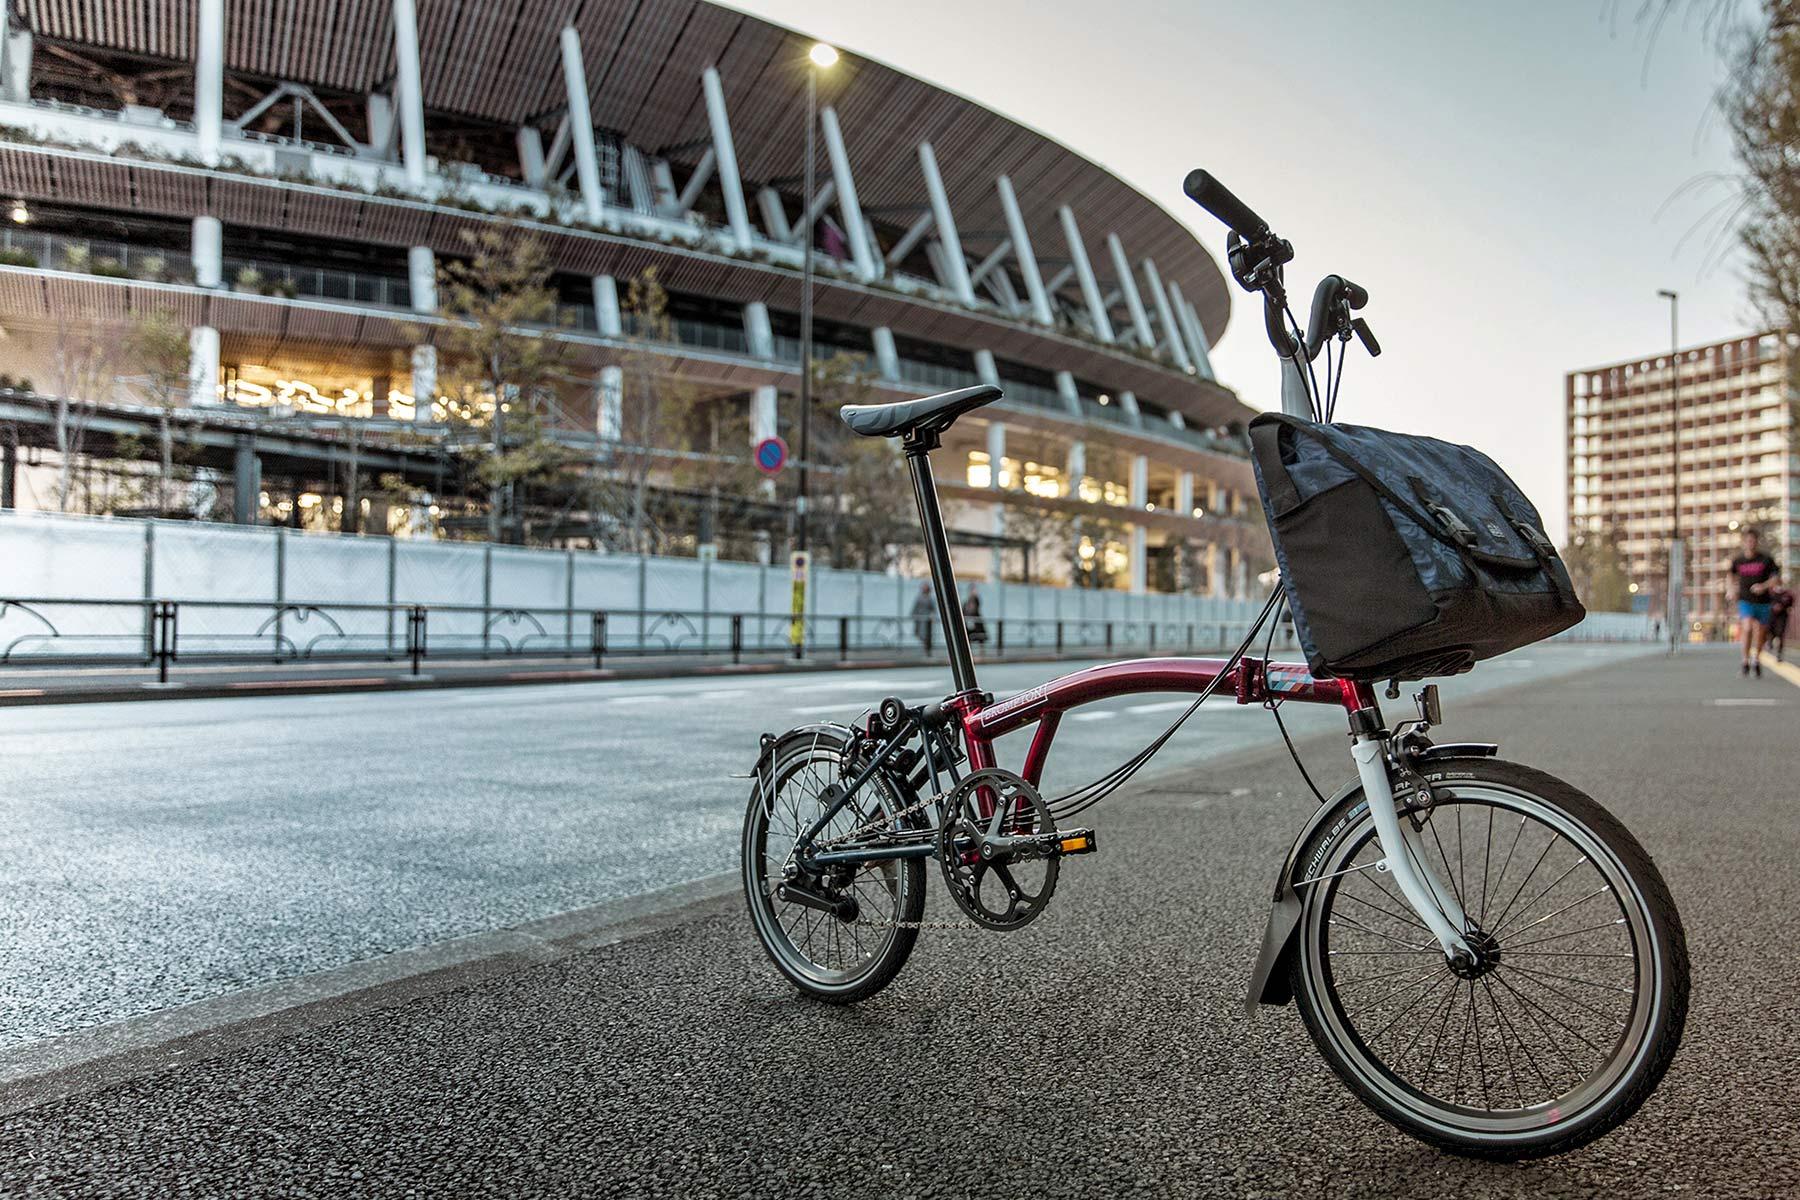 Brompton x Team GB folding bike, Tokyo 2020 Olympic limited edition, Brooks C17 Cambium all-weather saddle,stadium